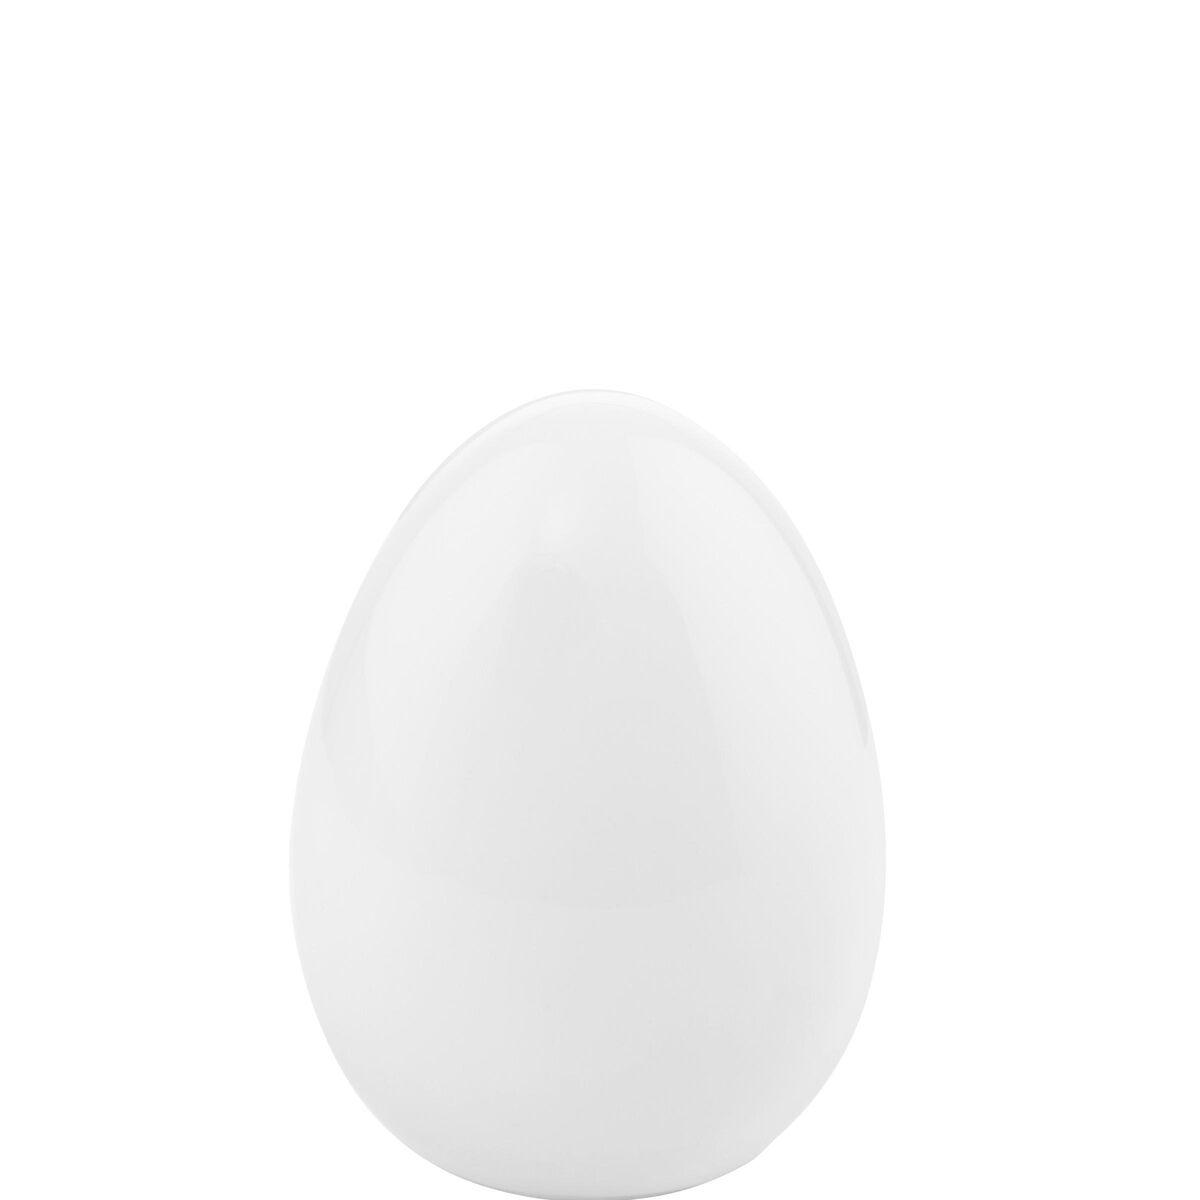 EASTER Keramik Ei 10cm, weiß